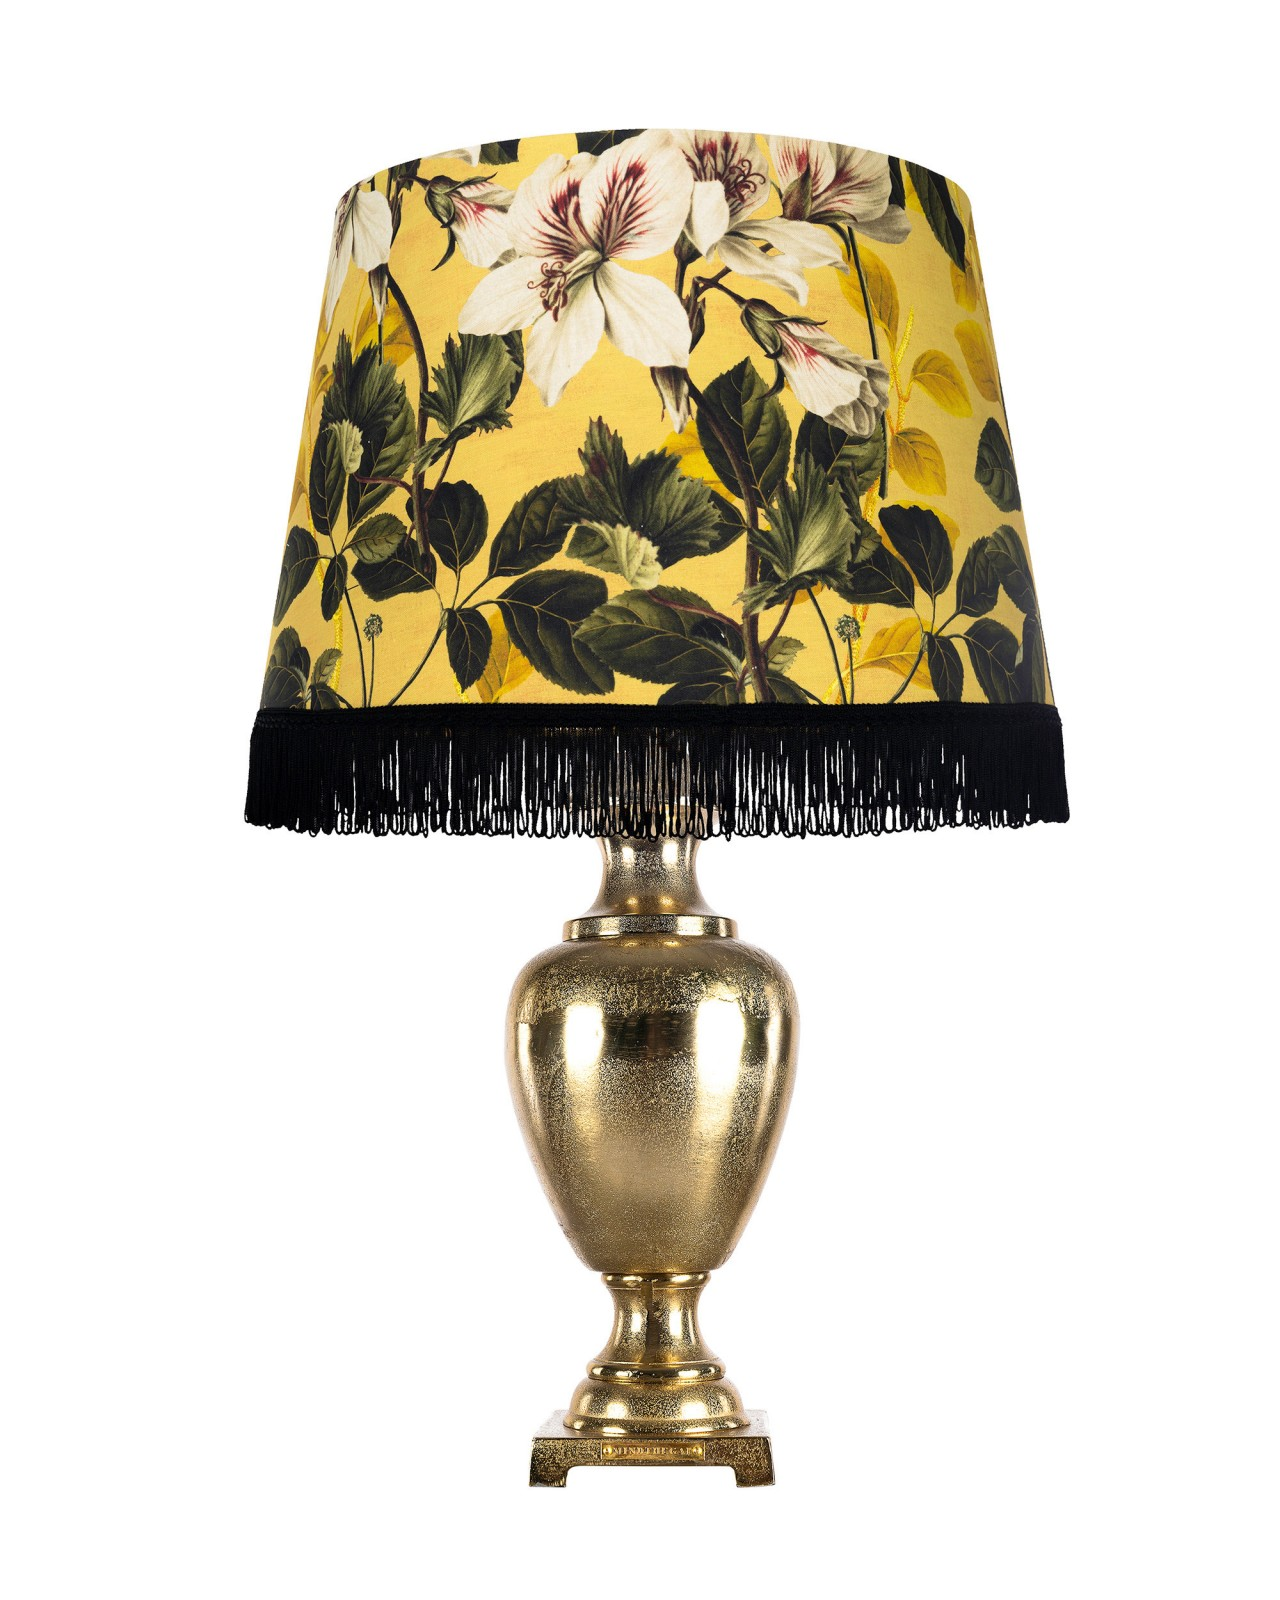 YELLOW GARDEN ULPIA Table Lamp